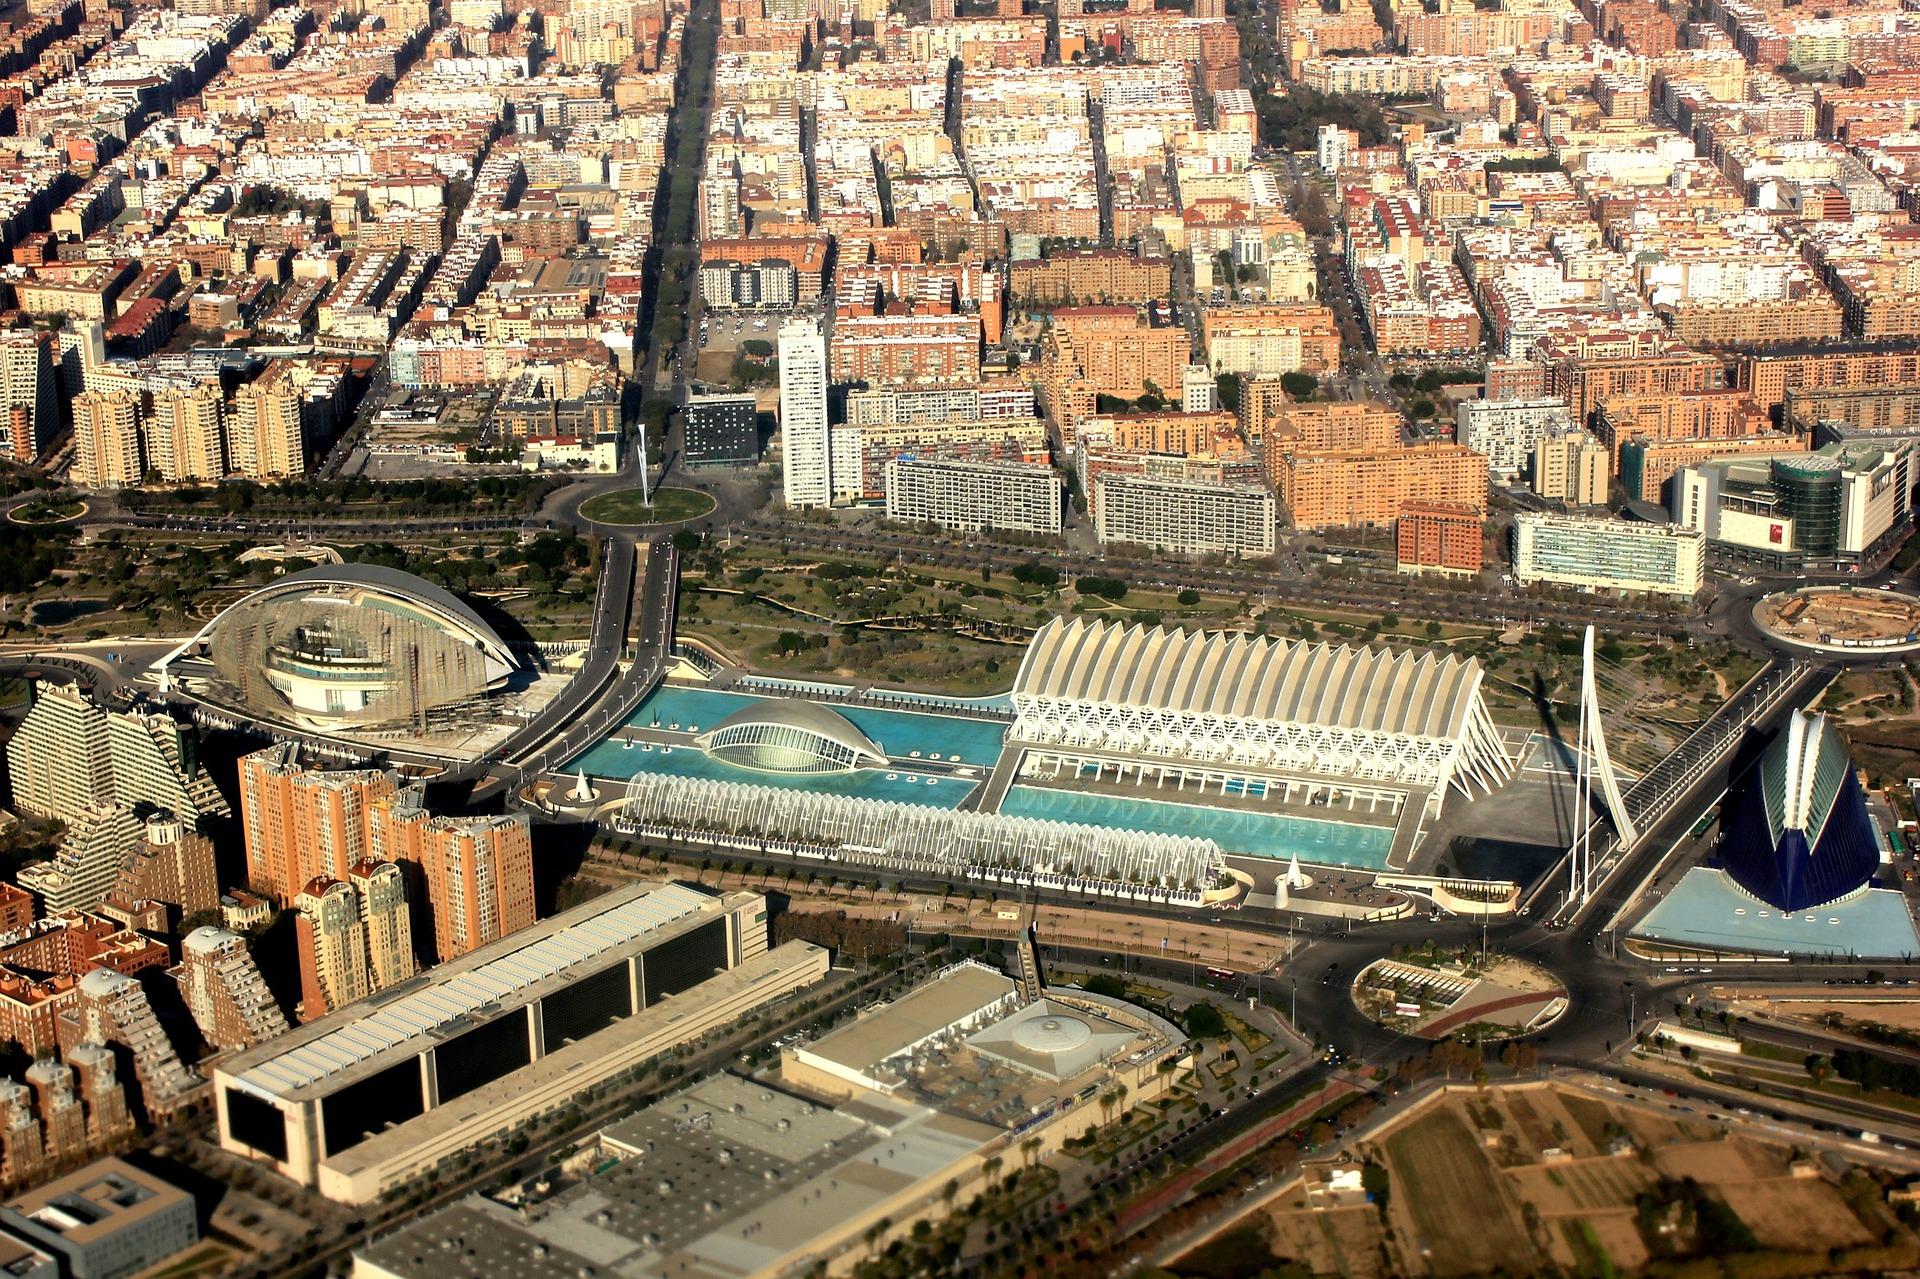 Valencia Sehenswürdigkeiten Valencia Sightseeing